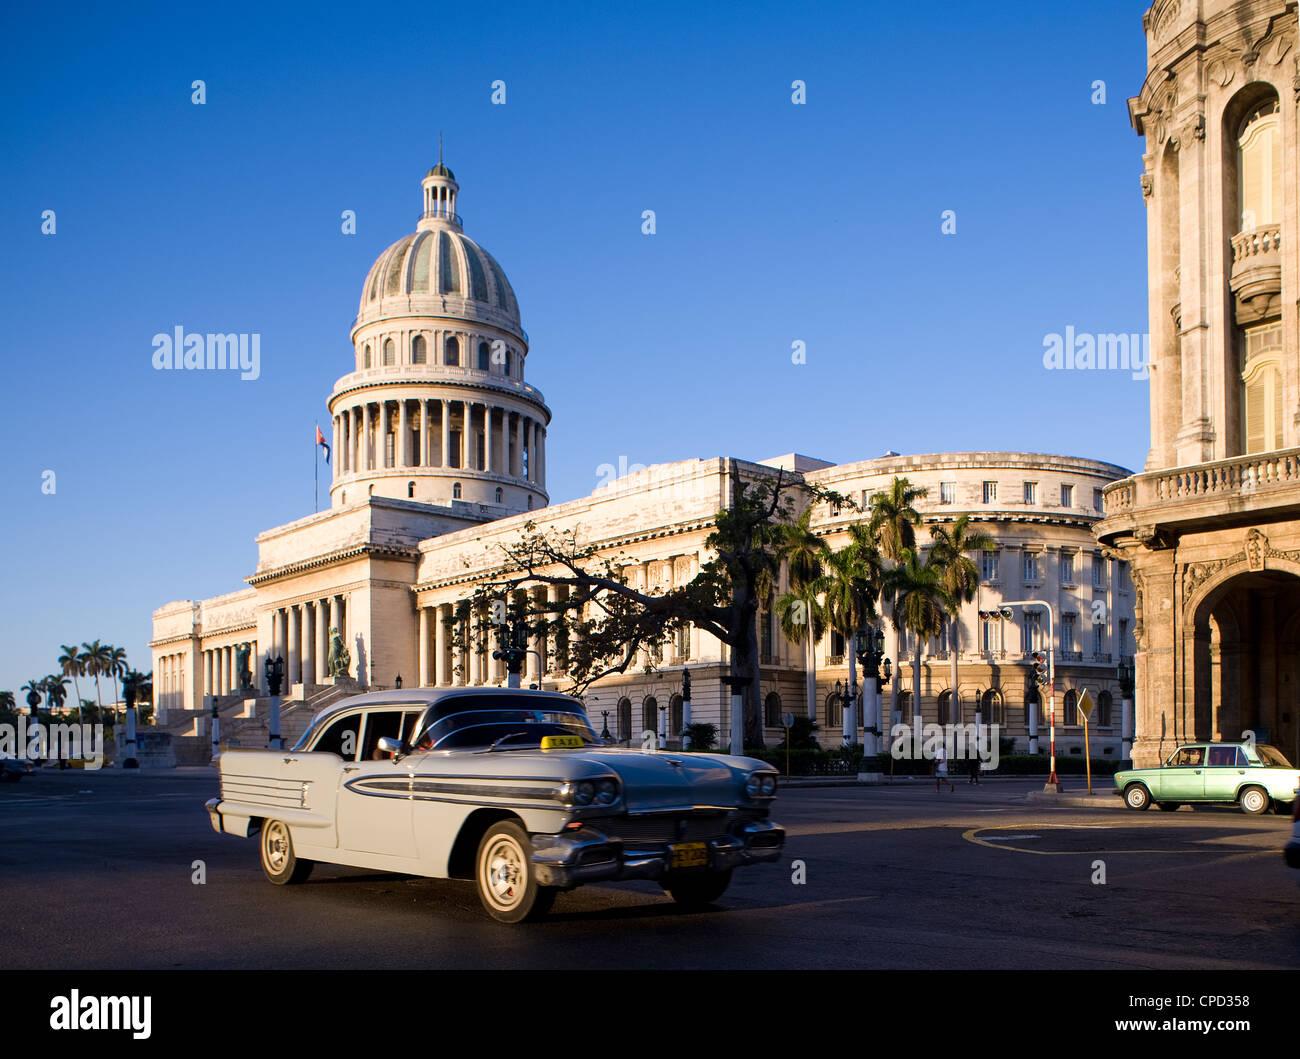 Capitolio, Zentral-Havanna, Kuba, Karibik, Mittelamerika Stockbild